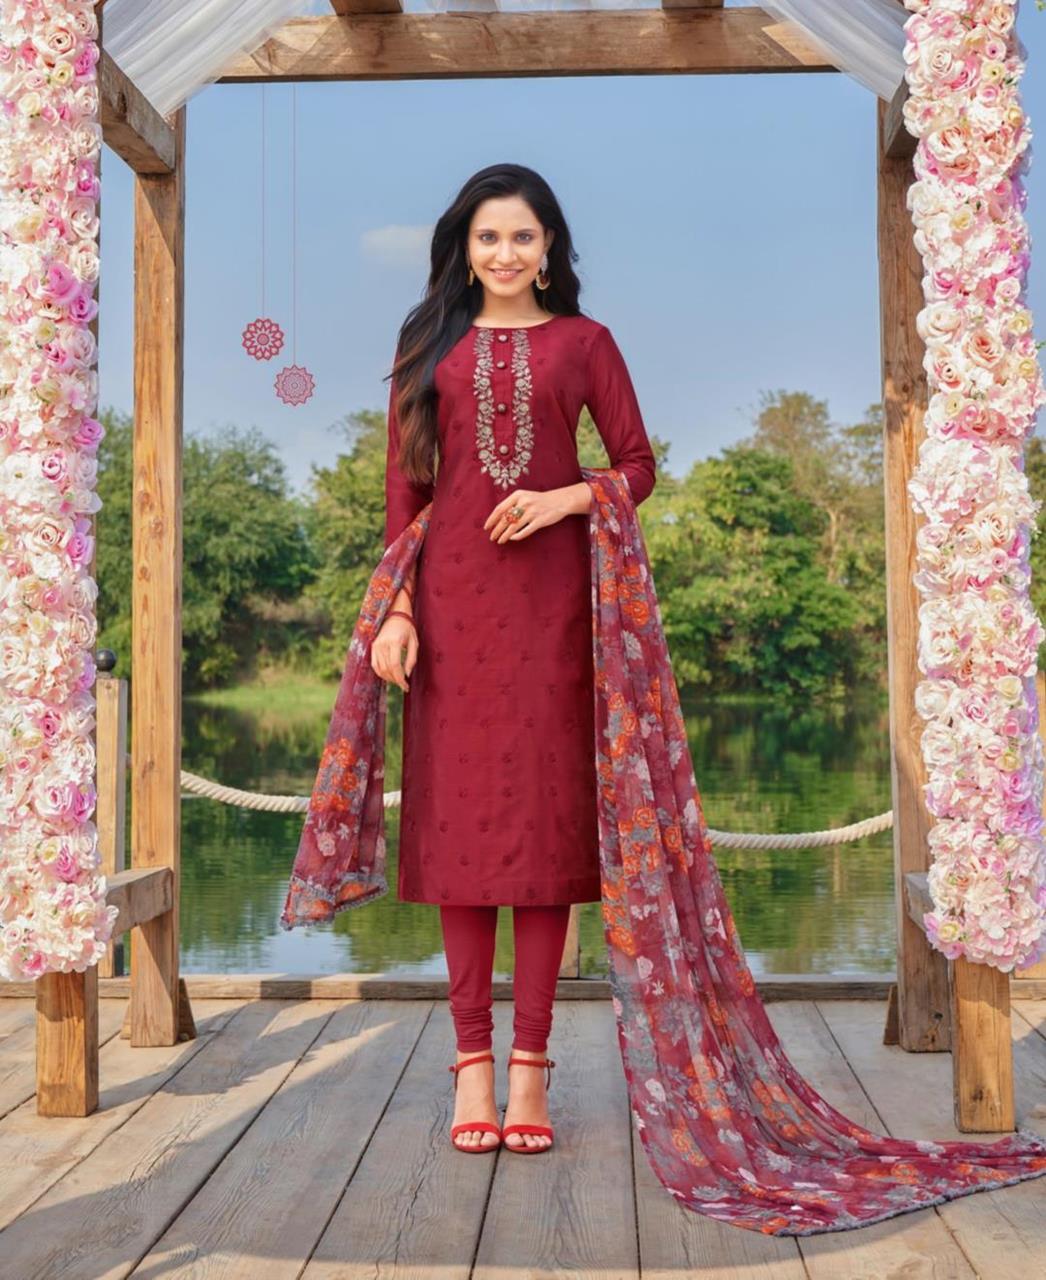 Cotton Straight cut Salwar Kameez in Maroon